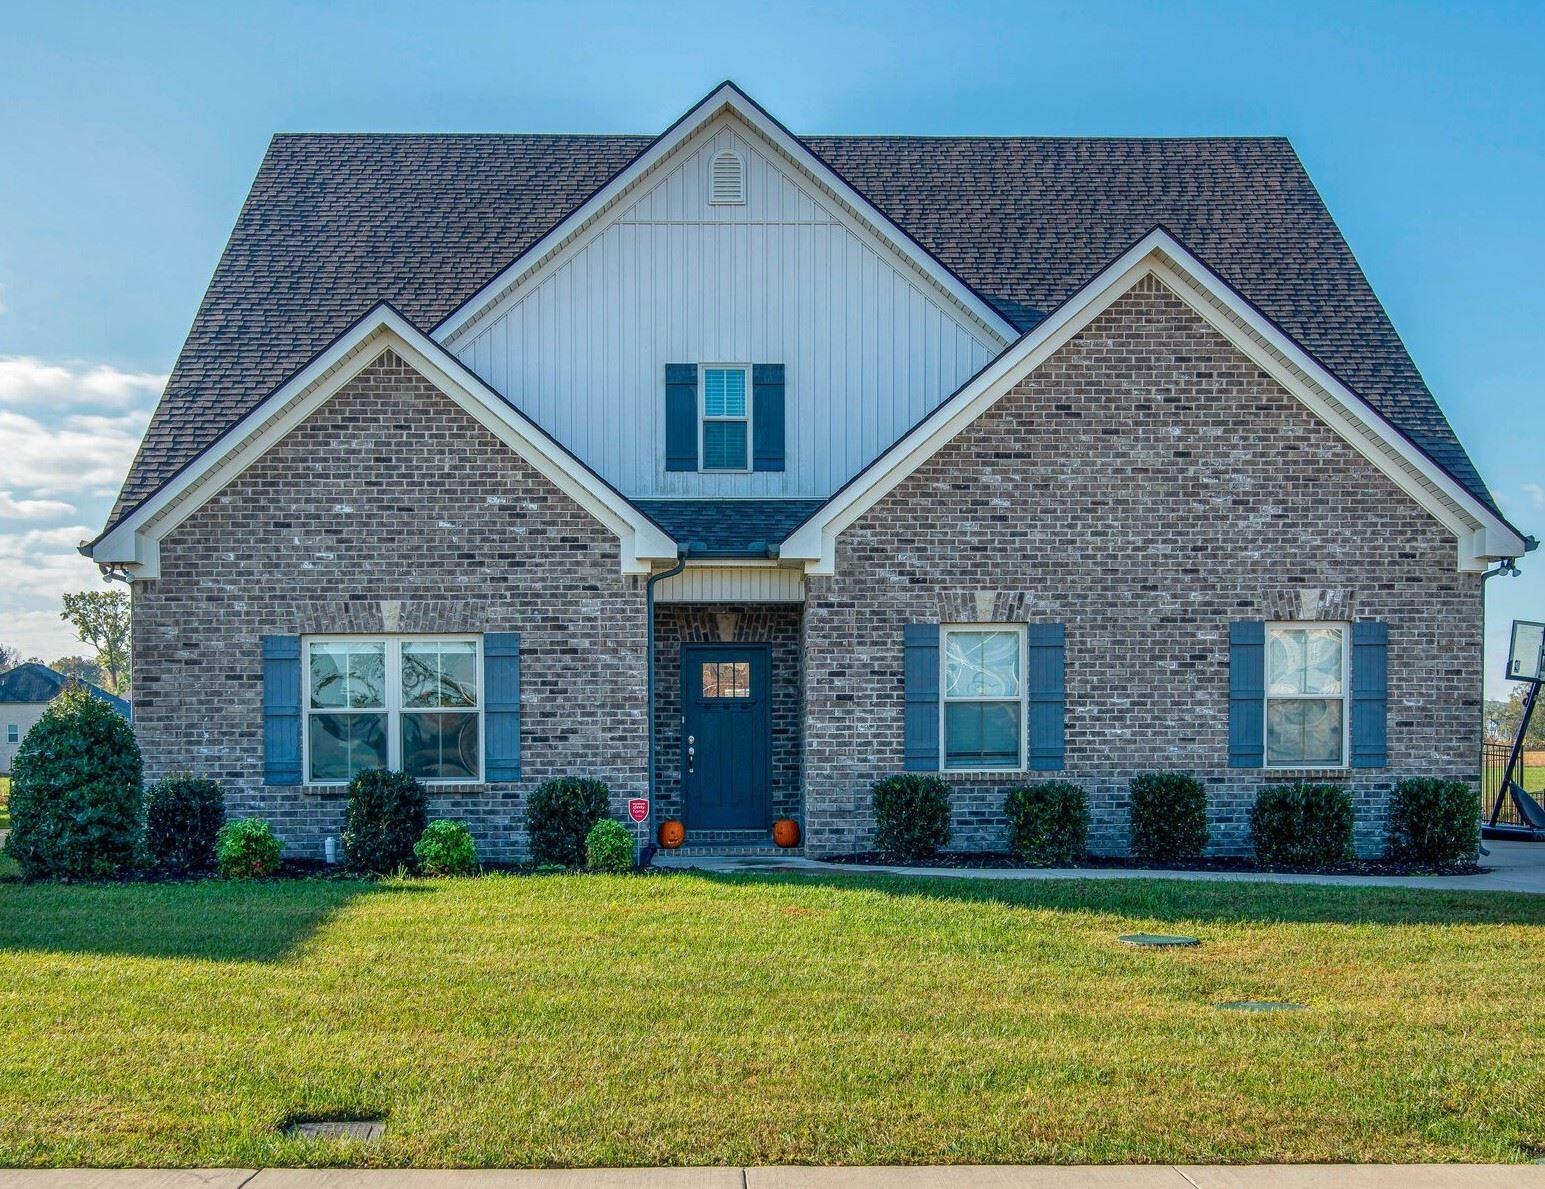 7009 Harriswood Ln, Murfreesboro, TN 37129 - MLS#: 2302180